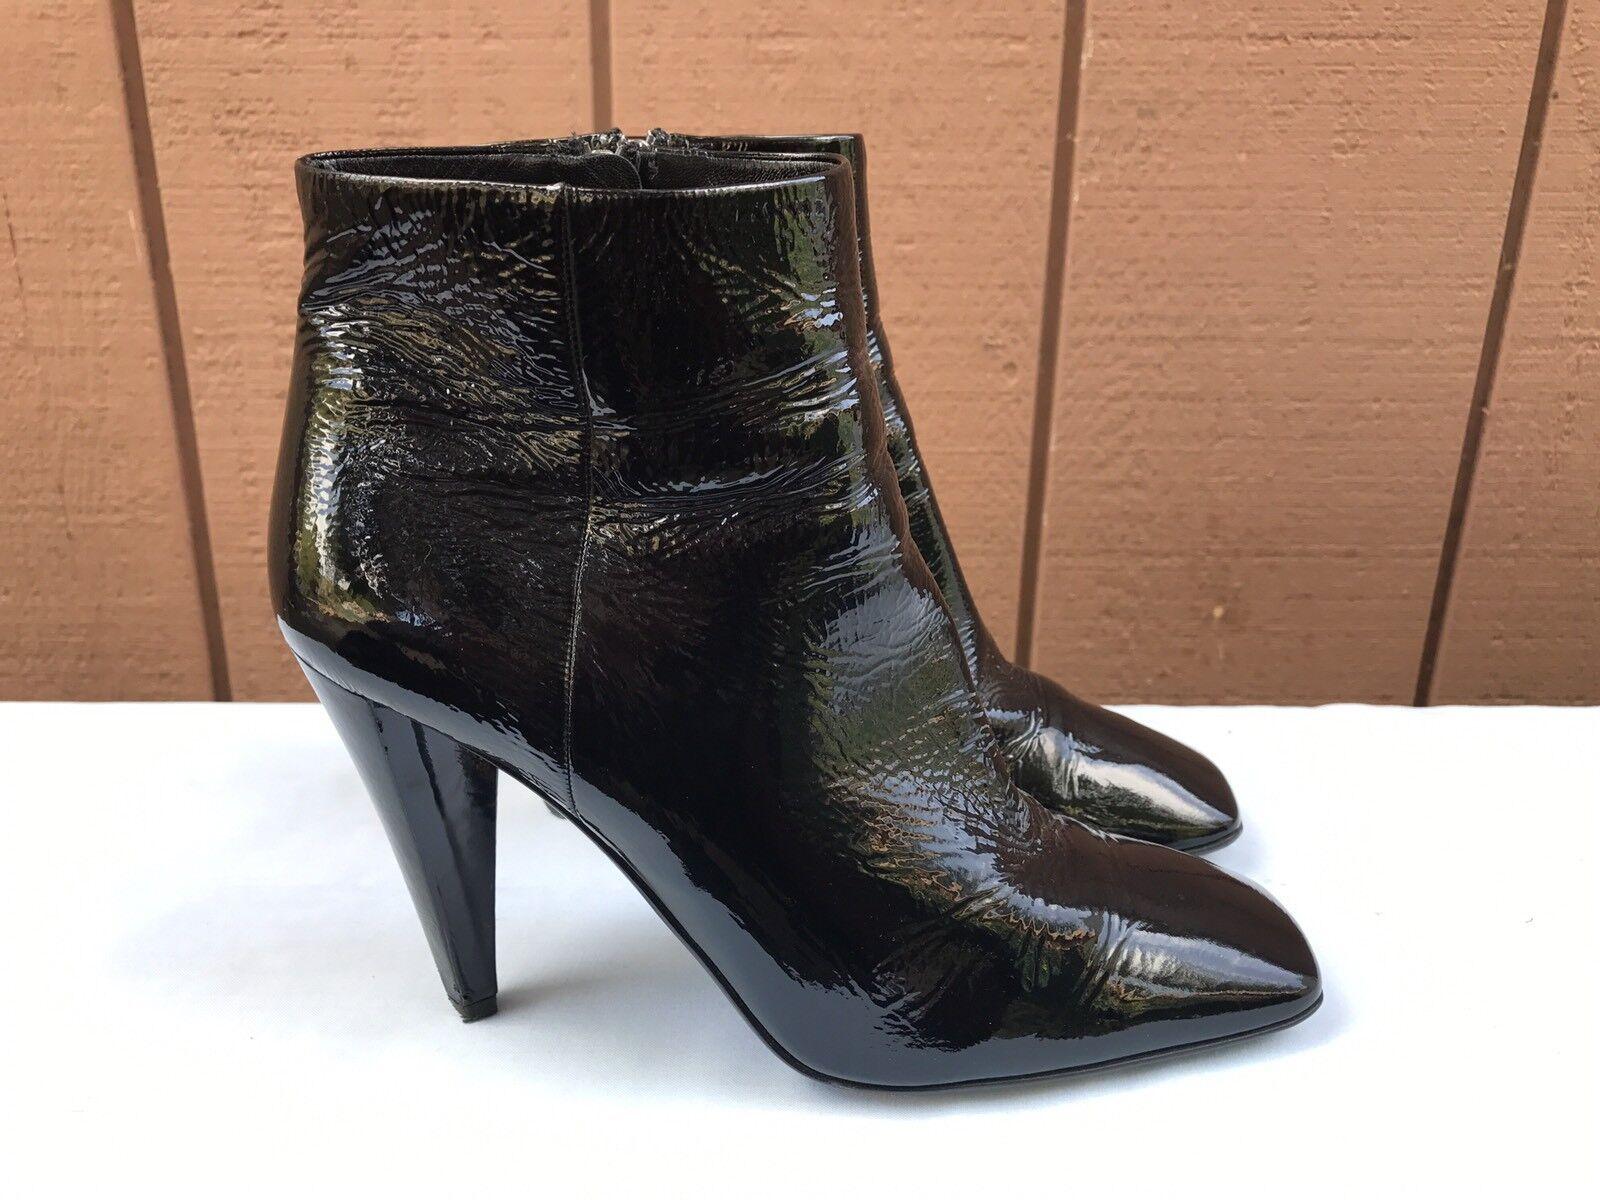 Prada Black Patent Leather Side Zipper High Heel Ankle Boot Shoe US 7.5